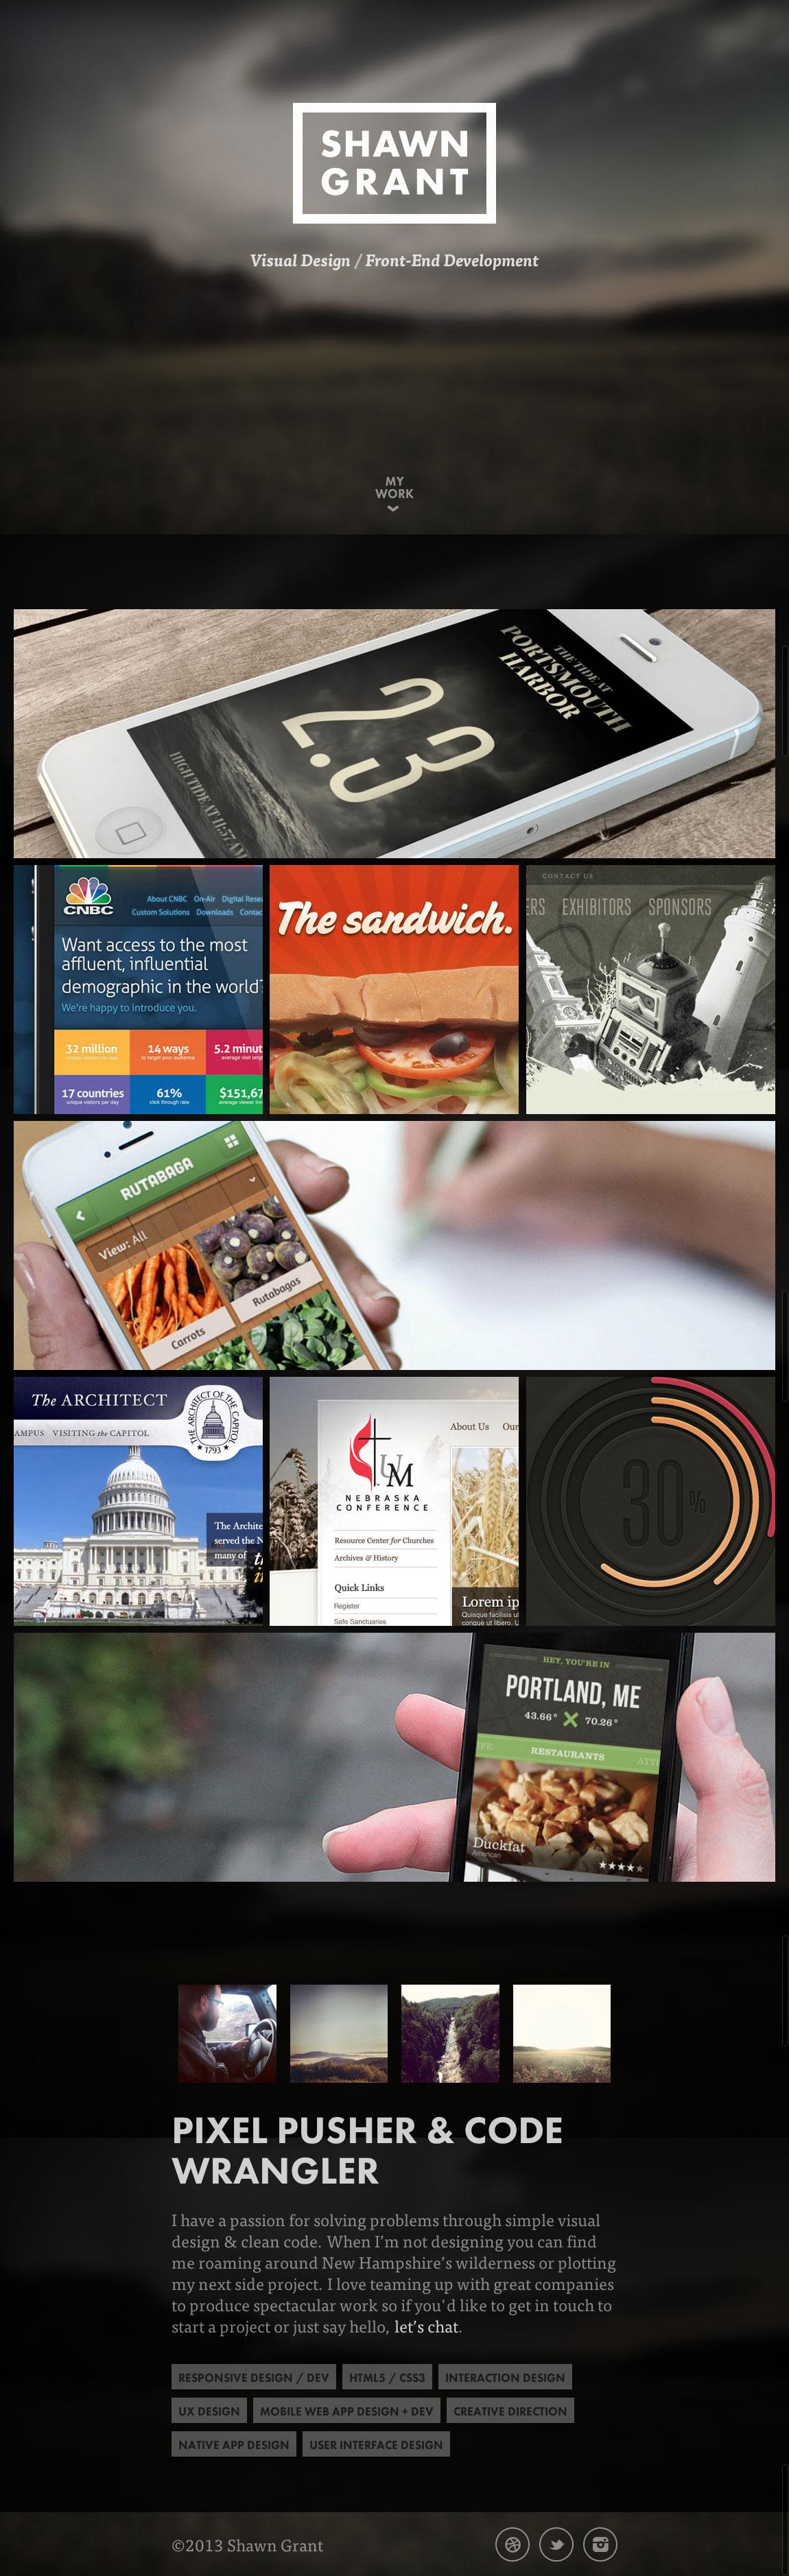 Shawn Grant Website Screenshot